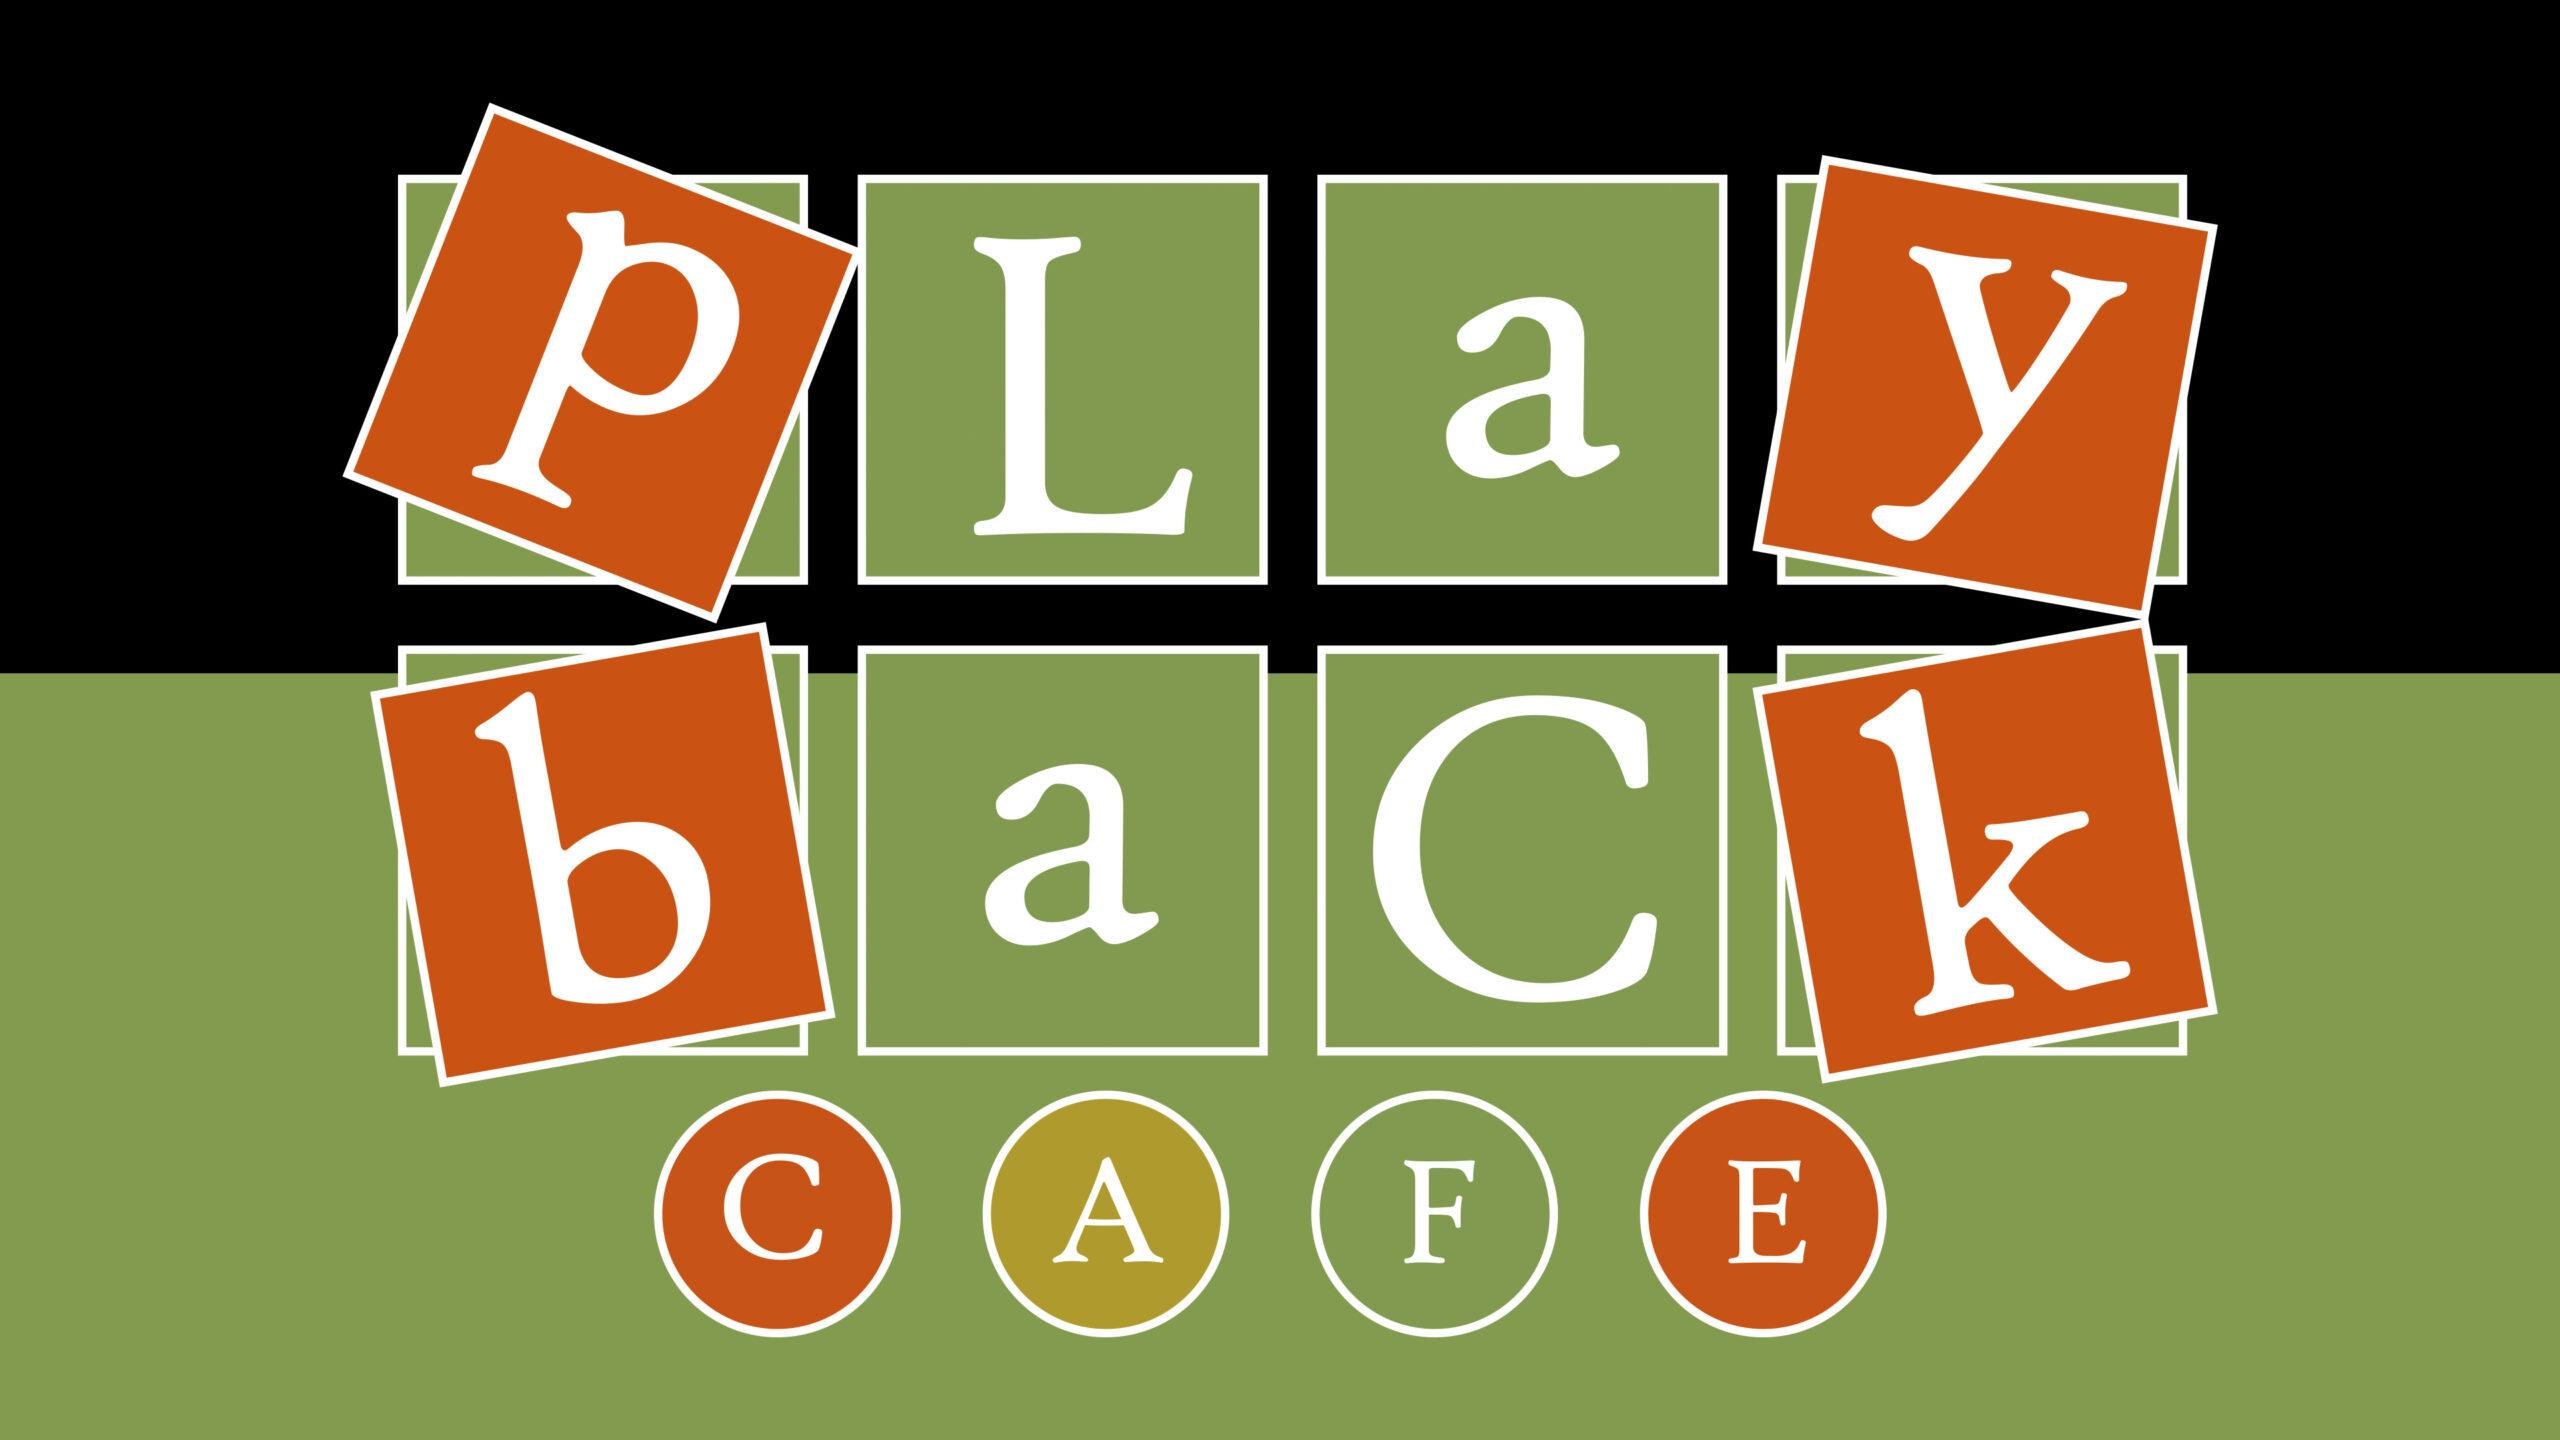 PLAYBACK CAFE